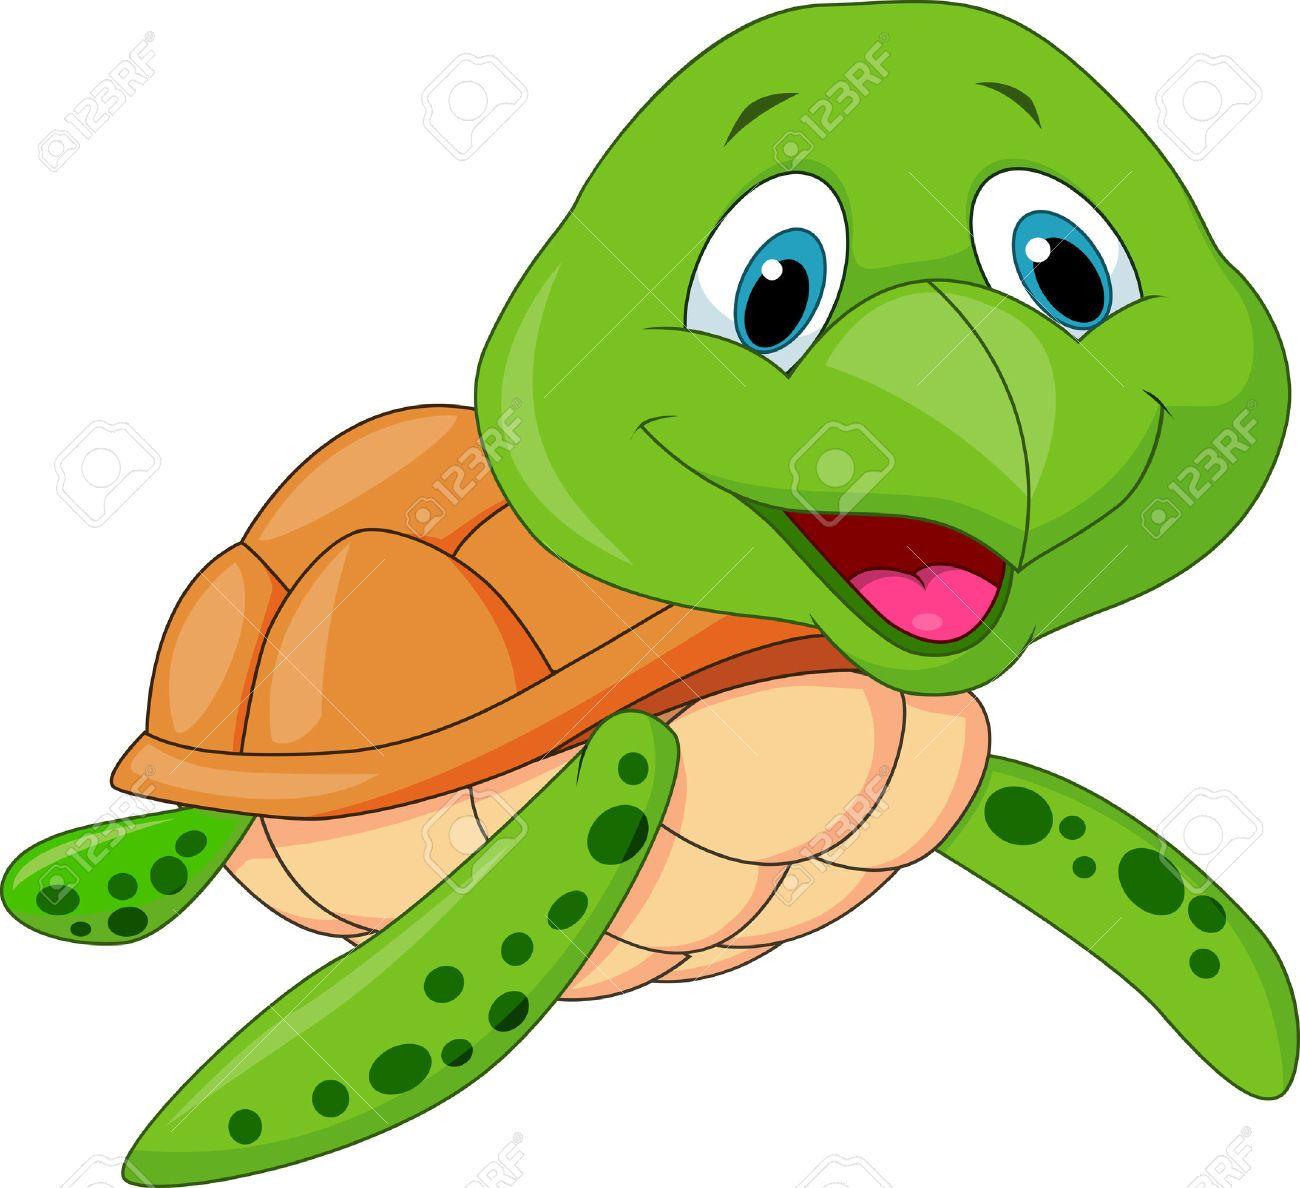 Cartoon turtle clipart.